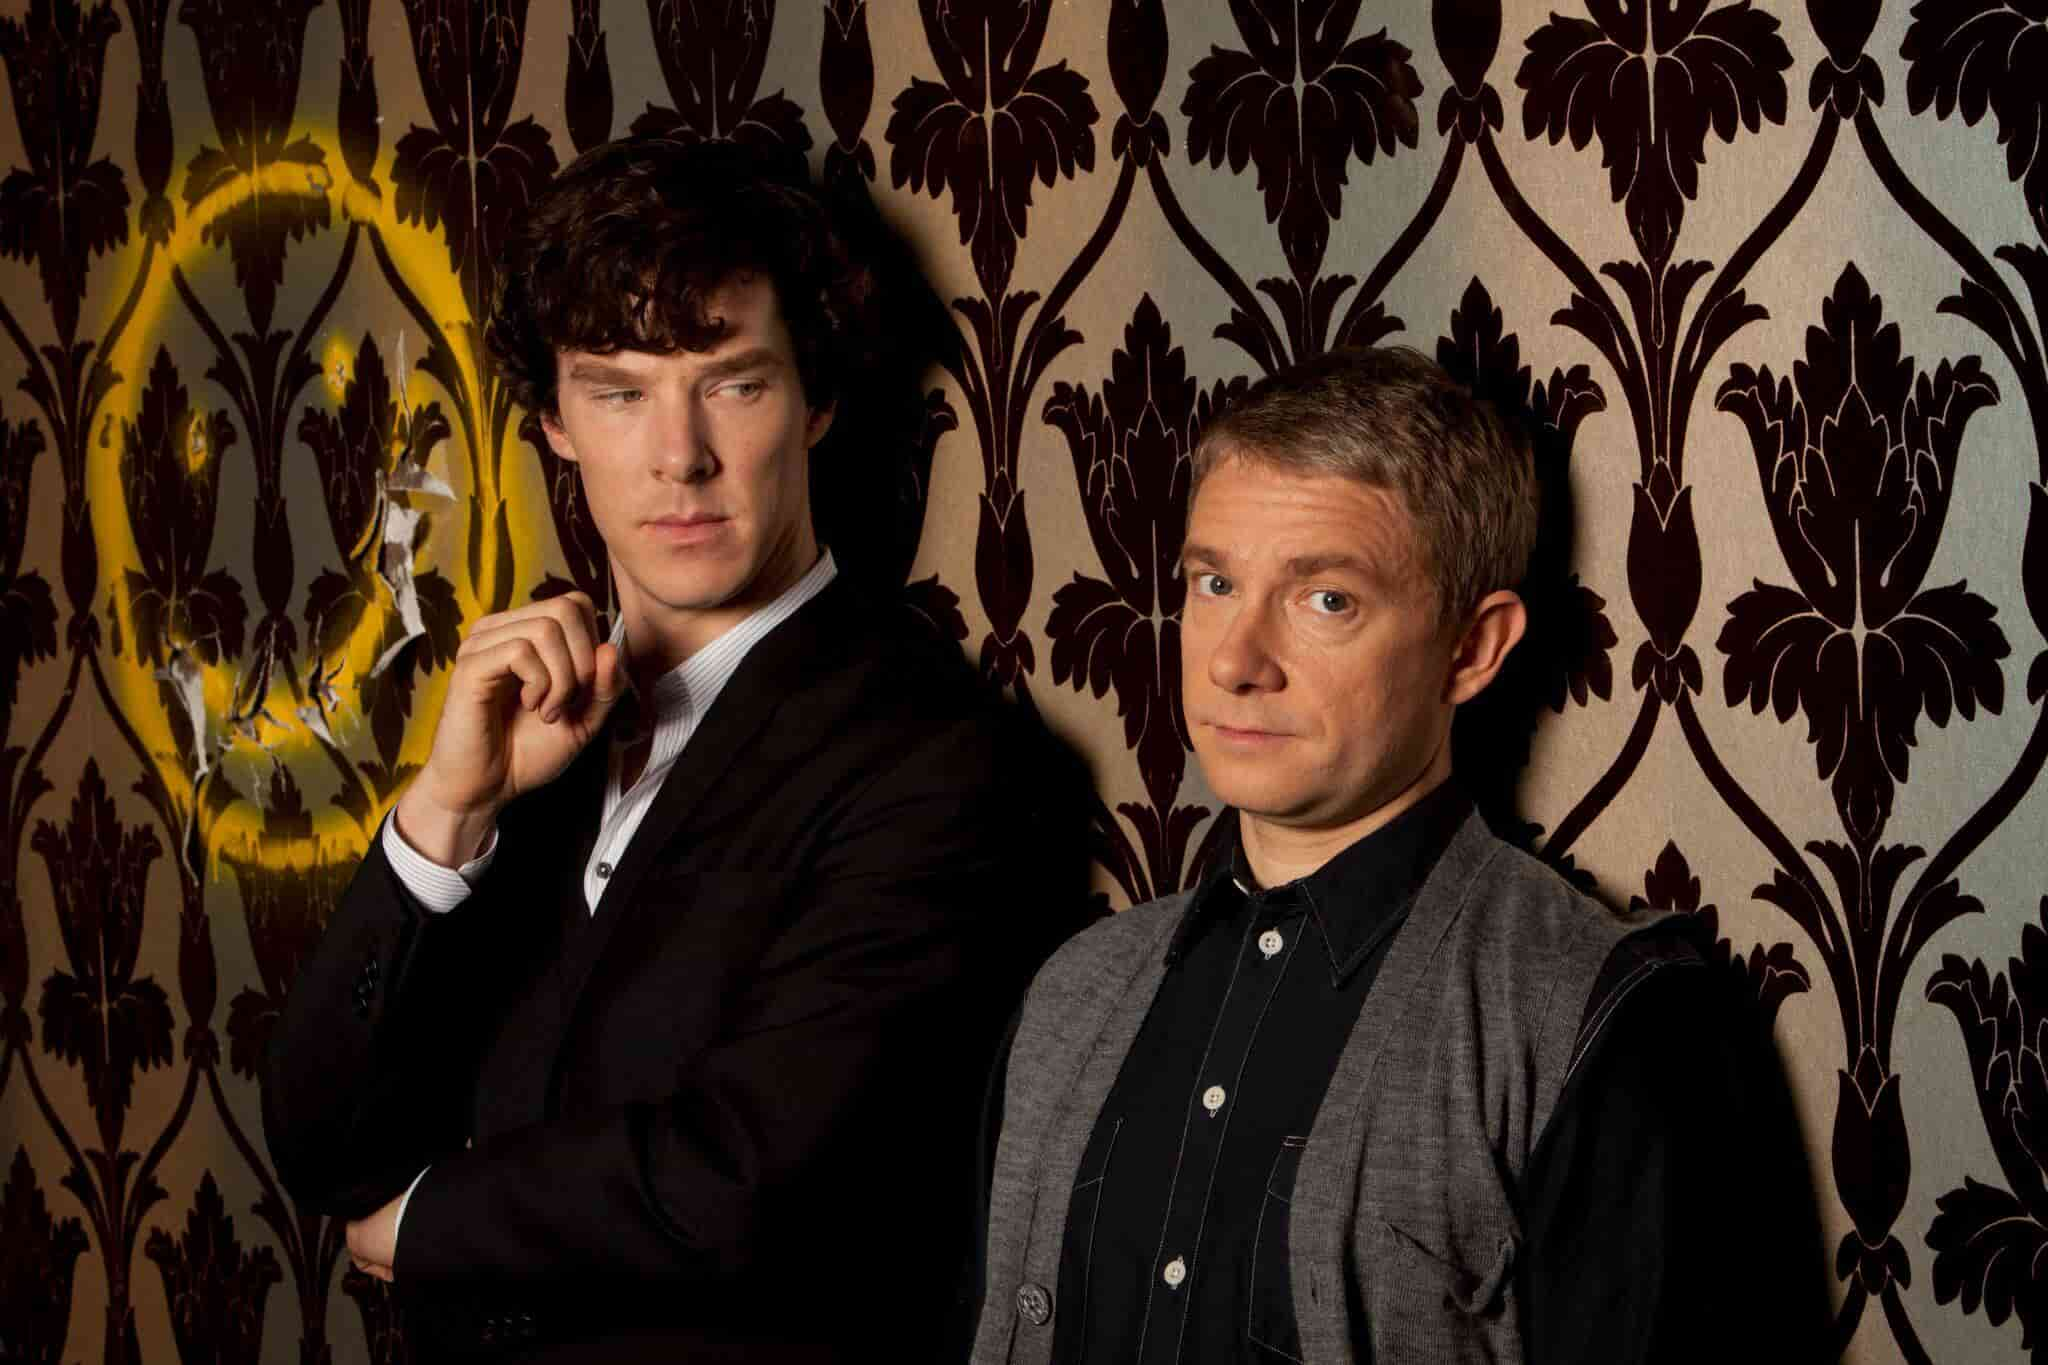 Benedict Cumberbatch and Martin Freeman in the hit show Shrelock.